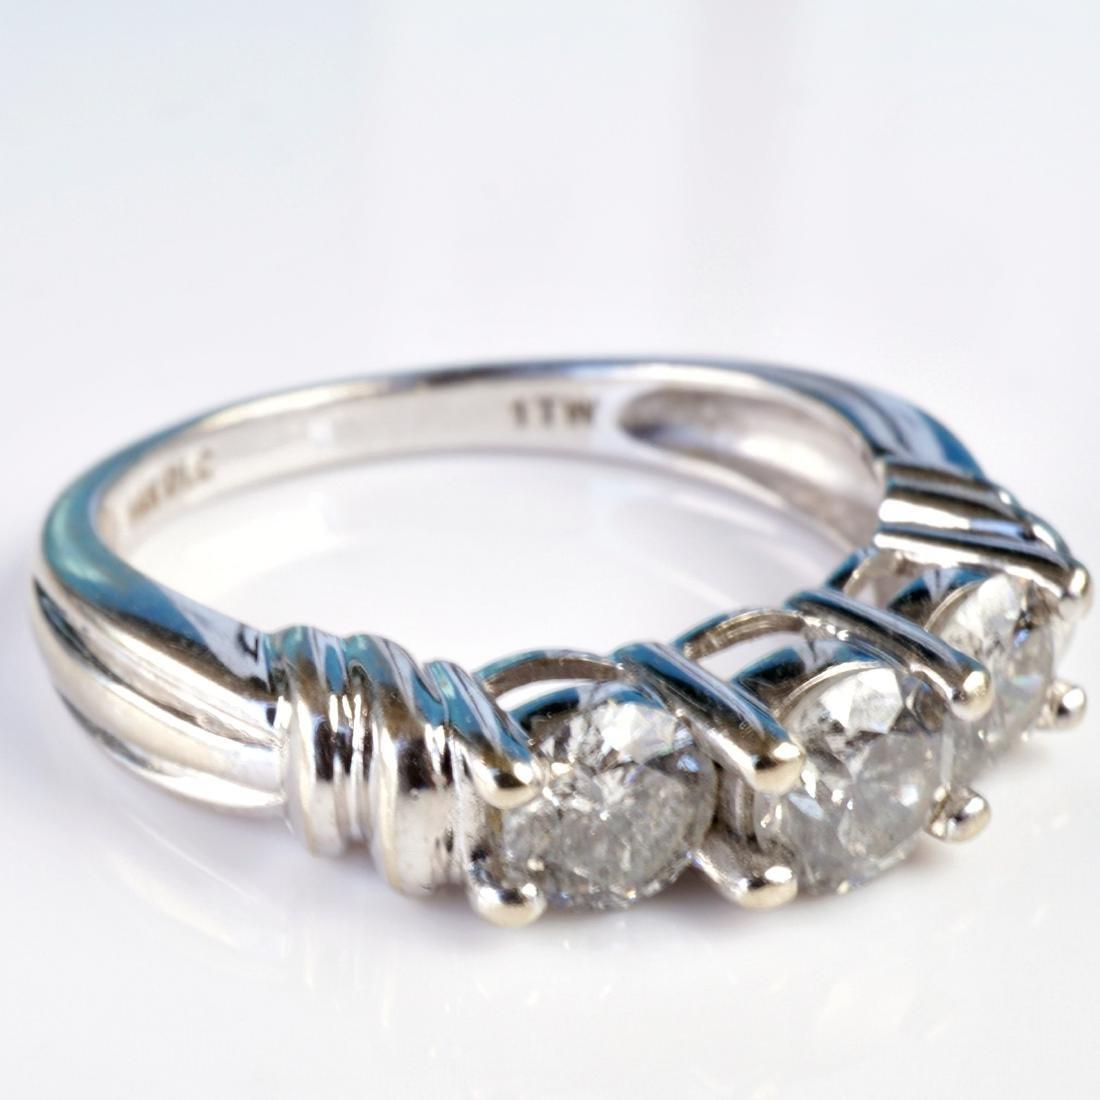 14k WG 1 CT Diamond Ring sz 6.75 - 2